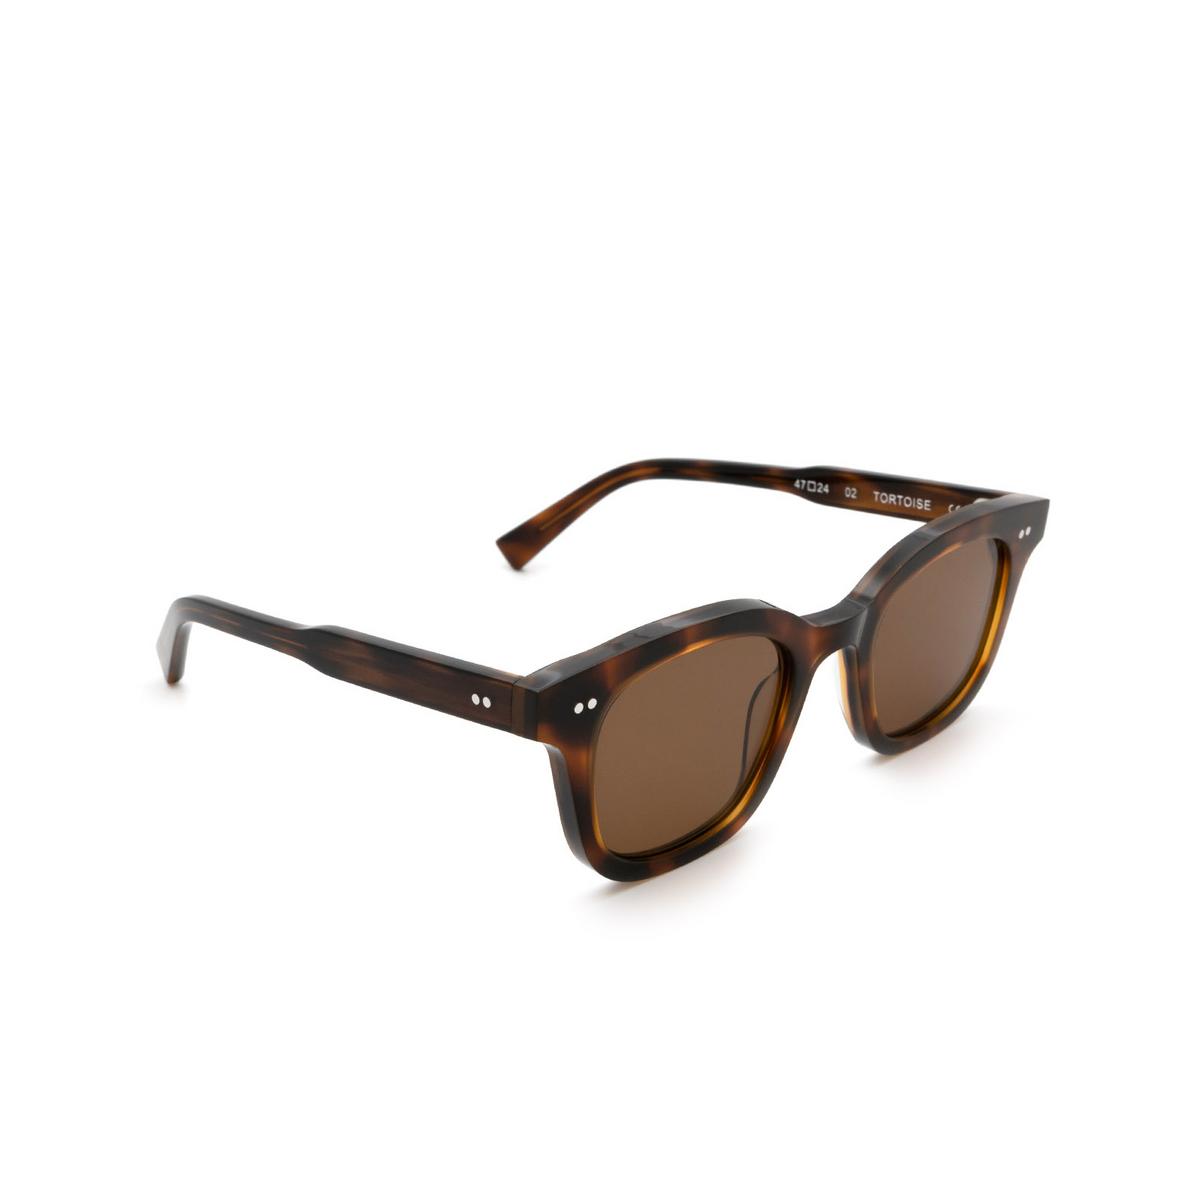 Chimi® Square Sunglasses: 02 color Tortoise - three-quarters view.